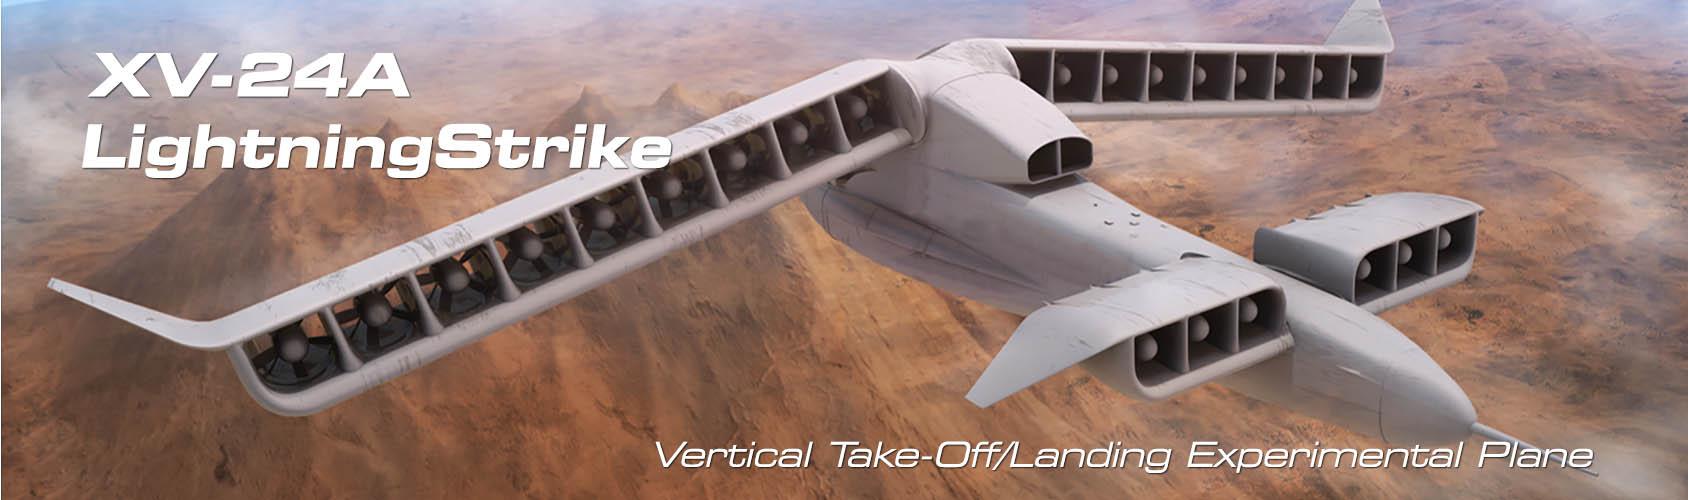 Aurora VTOL experimental plane